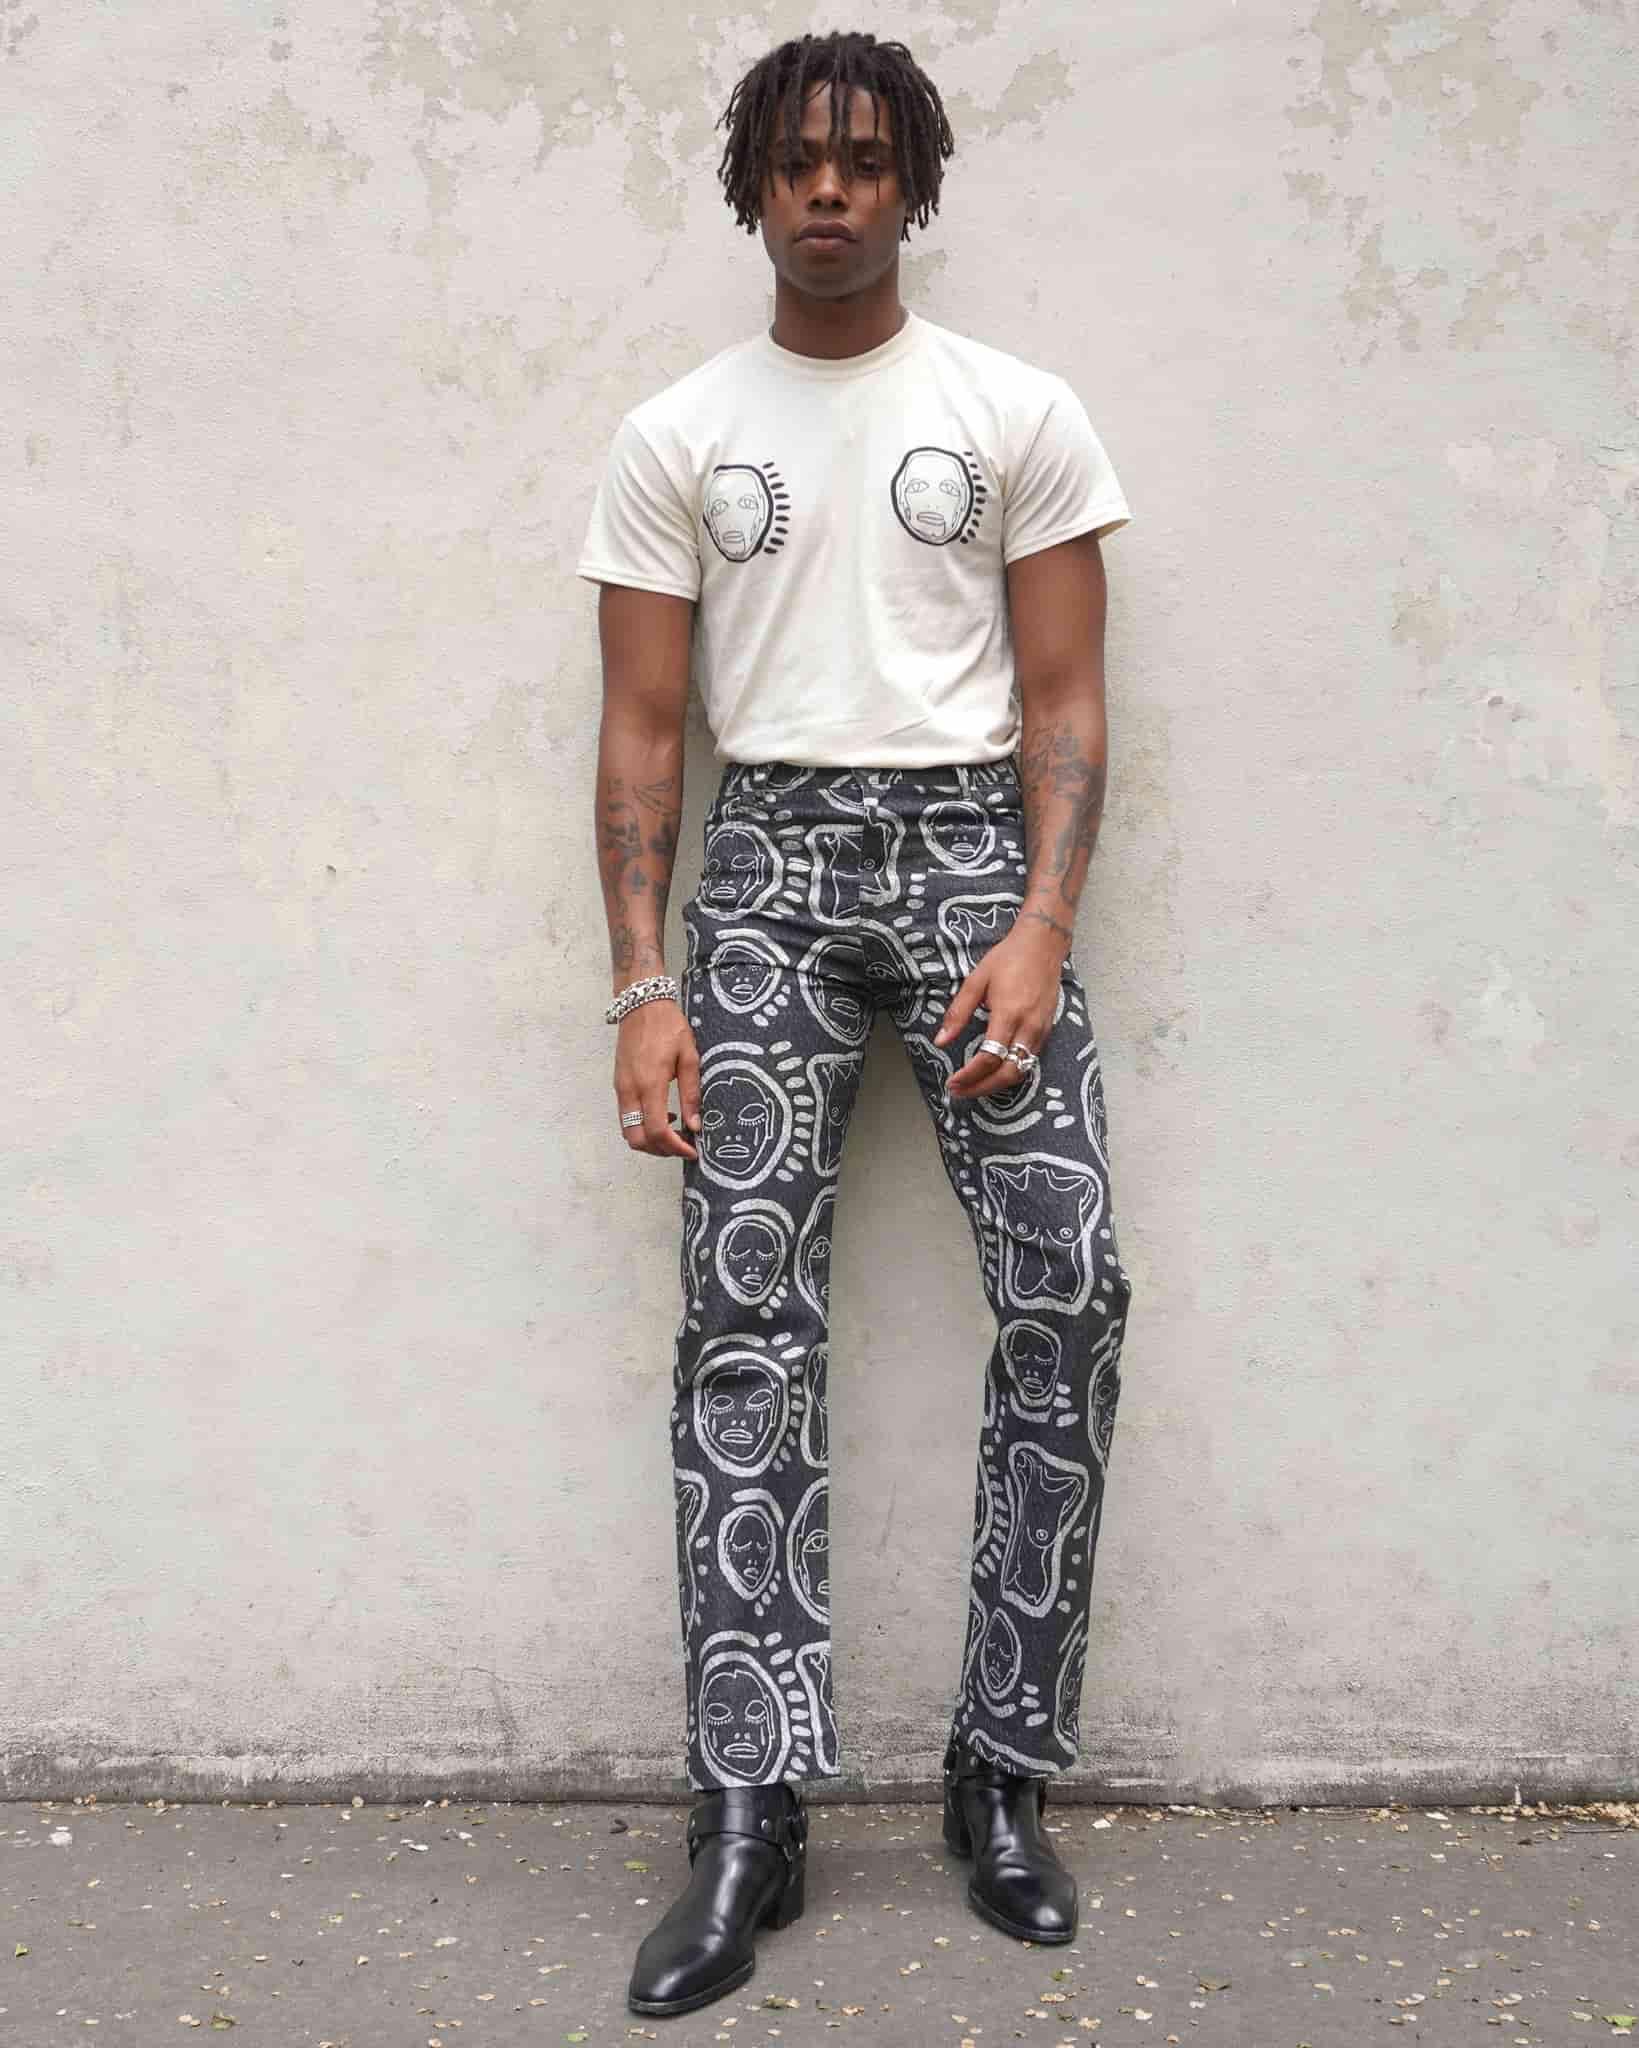 Patrick Church multimedia artist fashion designer painter LGBT LGBTQIA+ community empowered